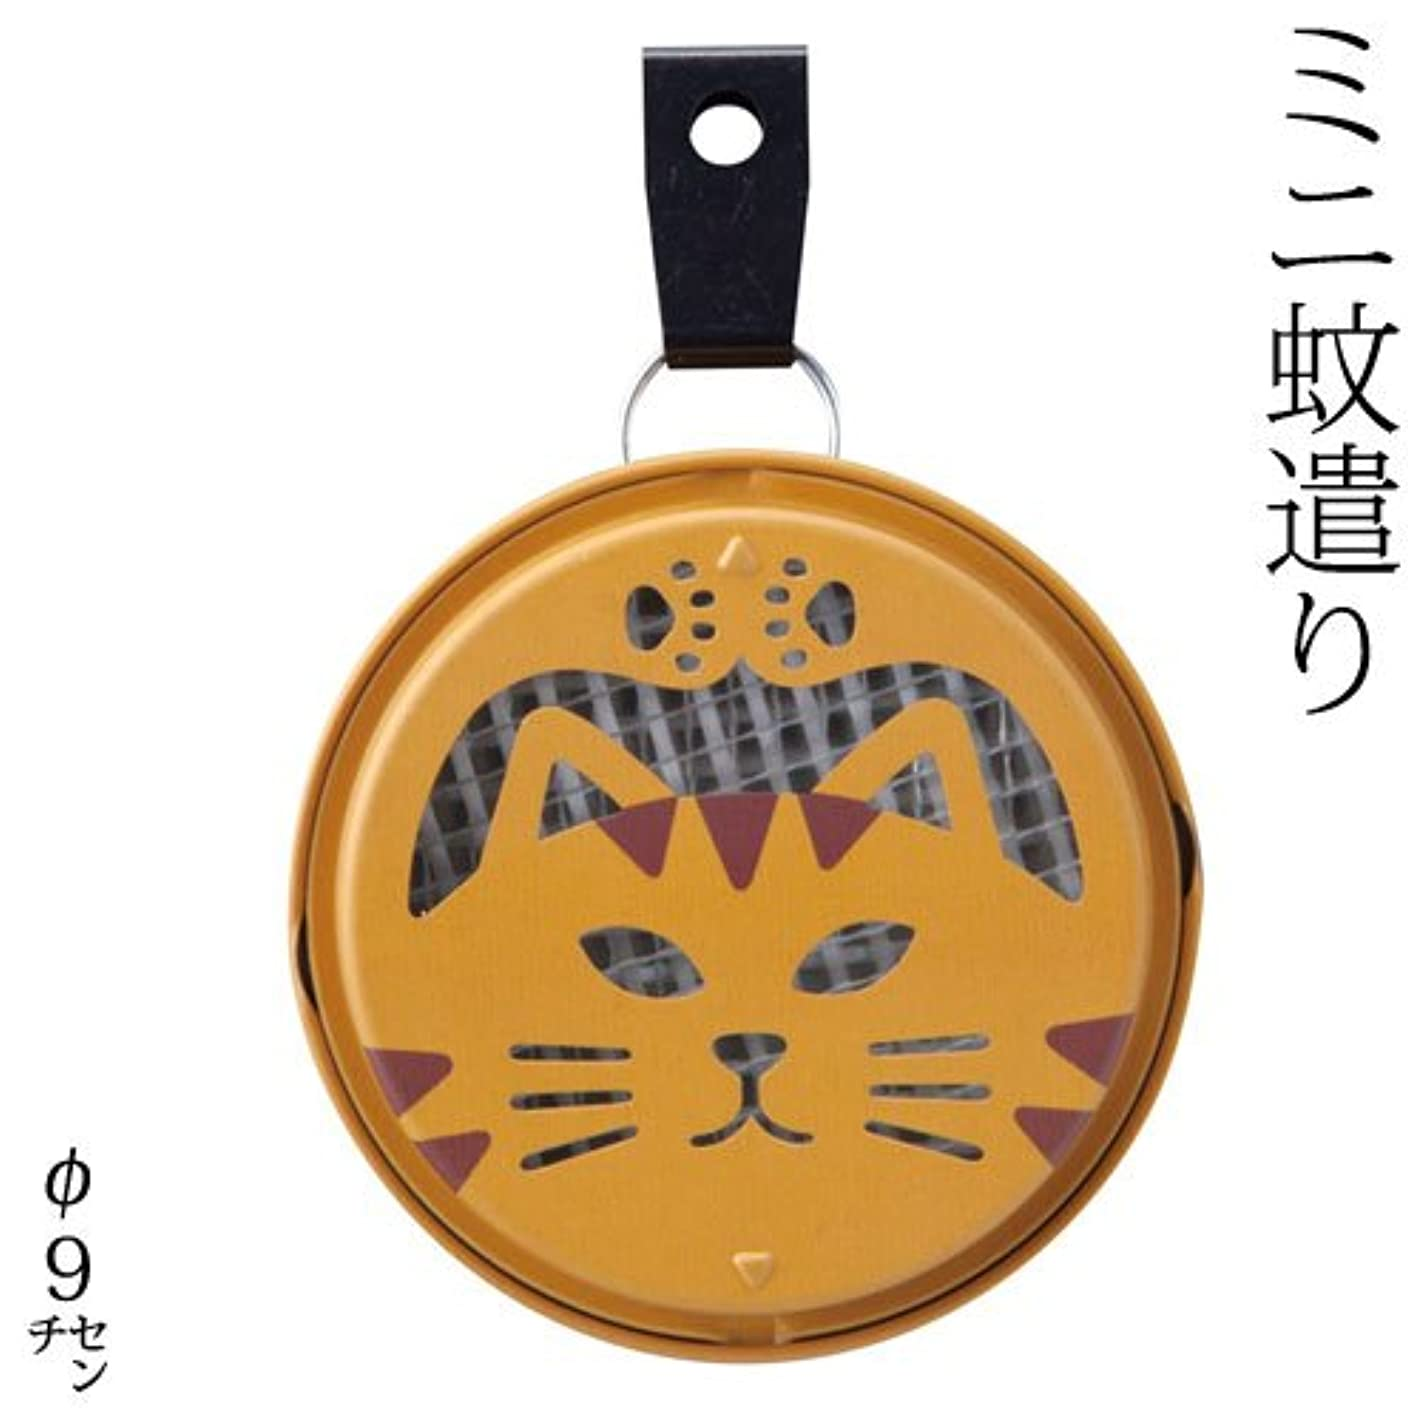 DECOLEポータブルミニ蚊遣りトラ猫 (SK-87513)吊り下げ?床置き対応Portable mini Kayari